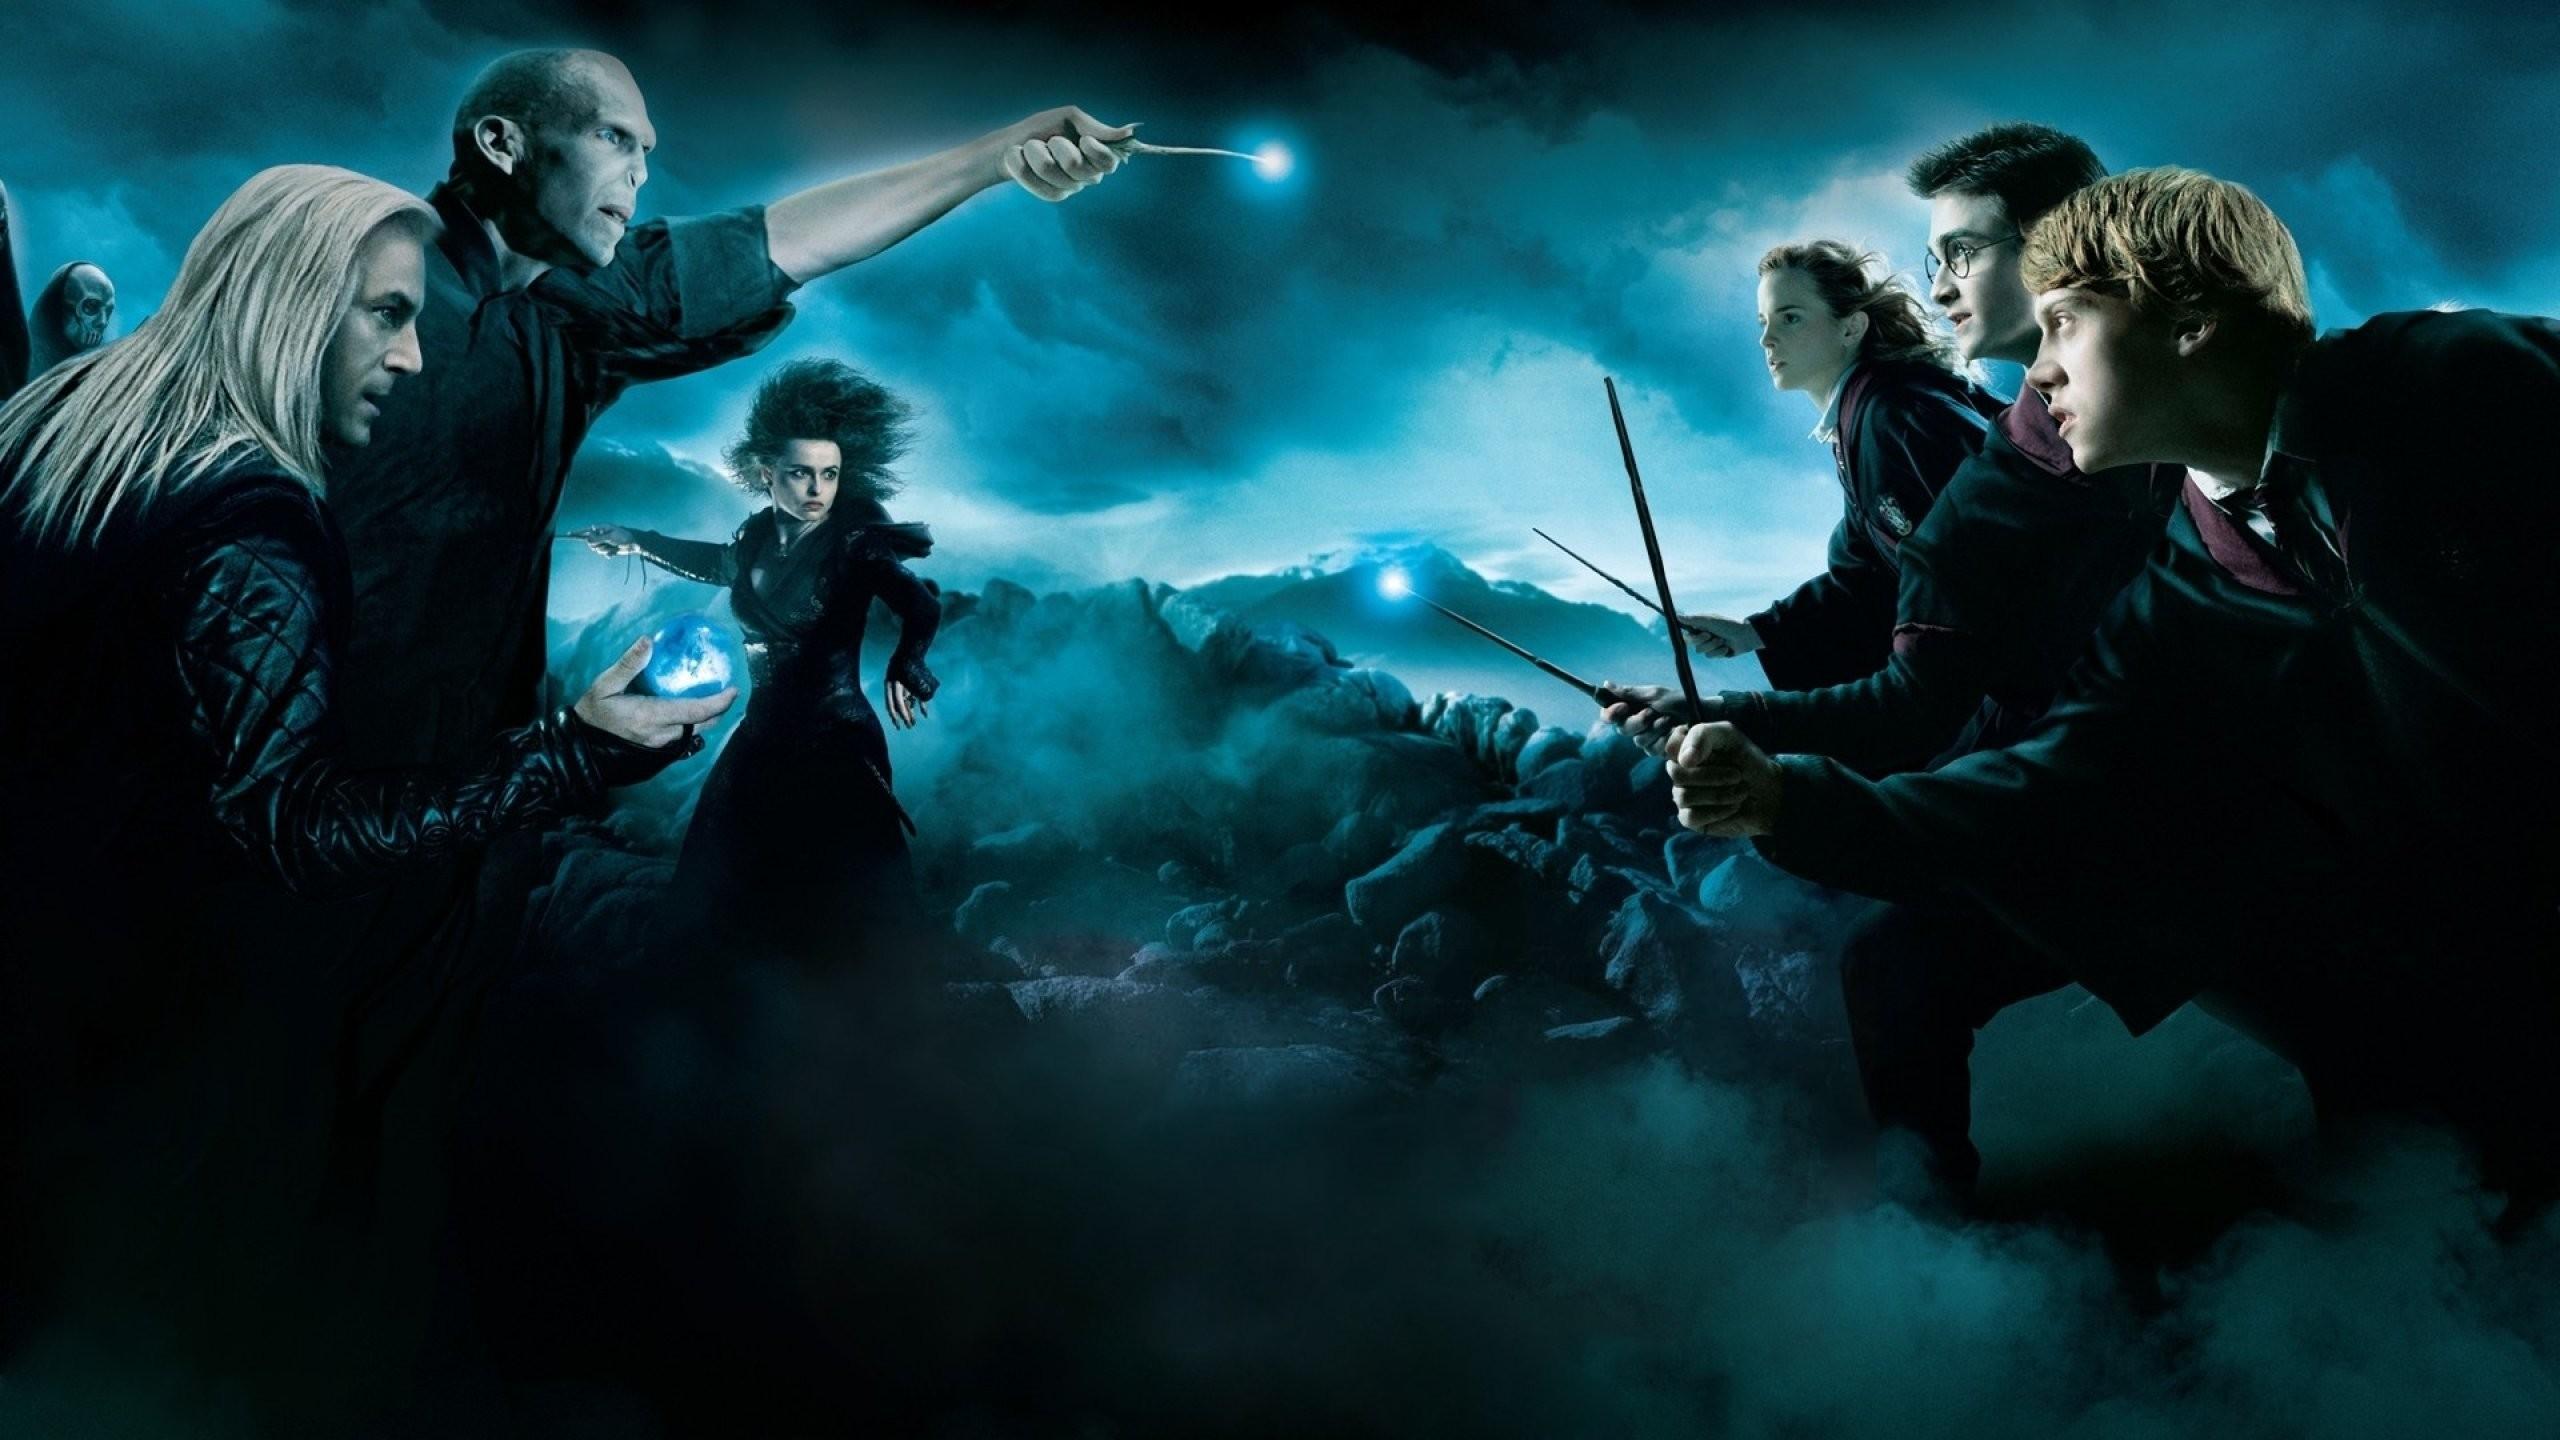 Must see Wallpaper Harry Potter Imac - 17434  Pic_561785.jpg